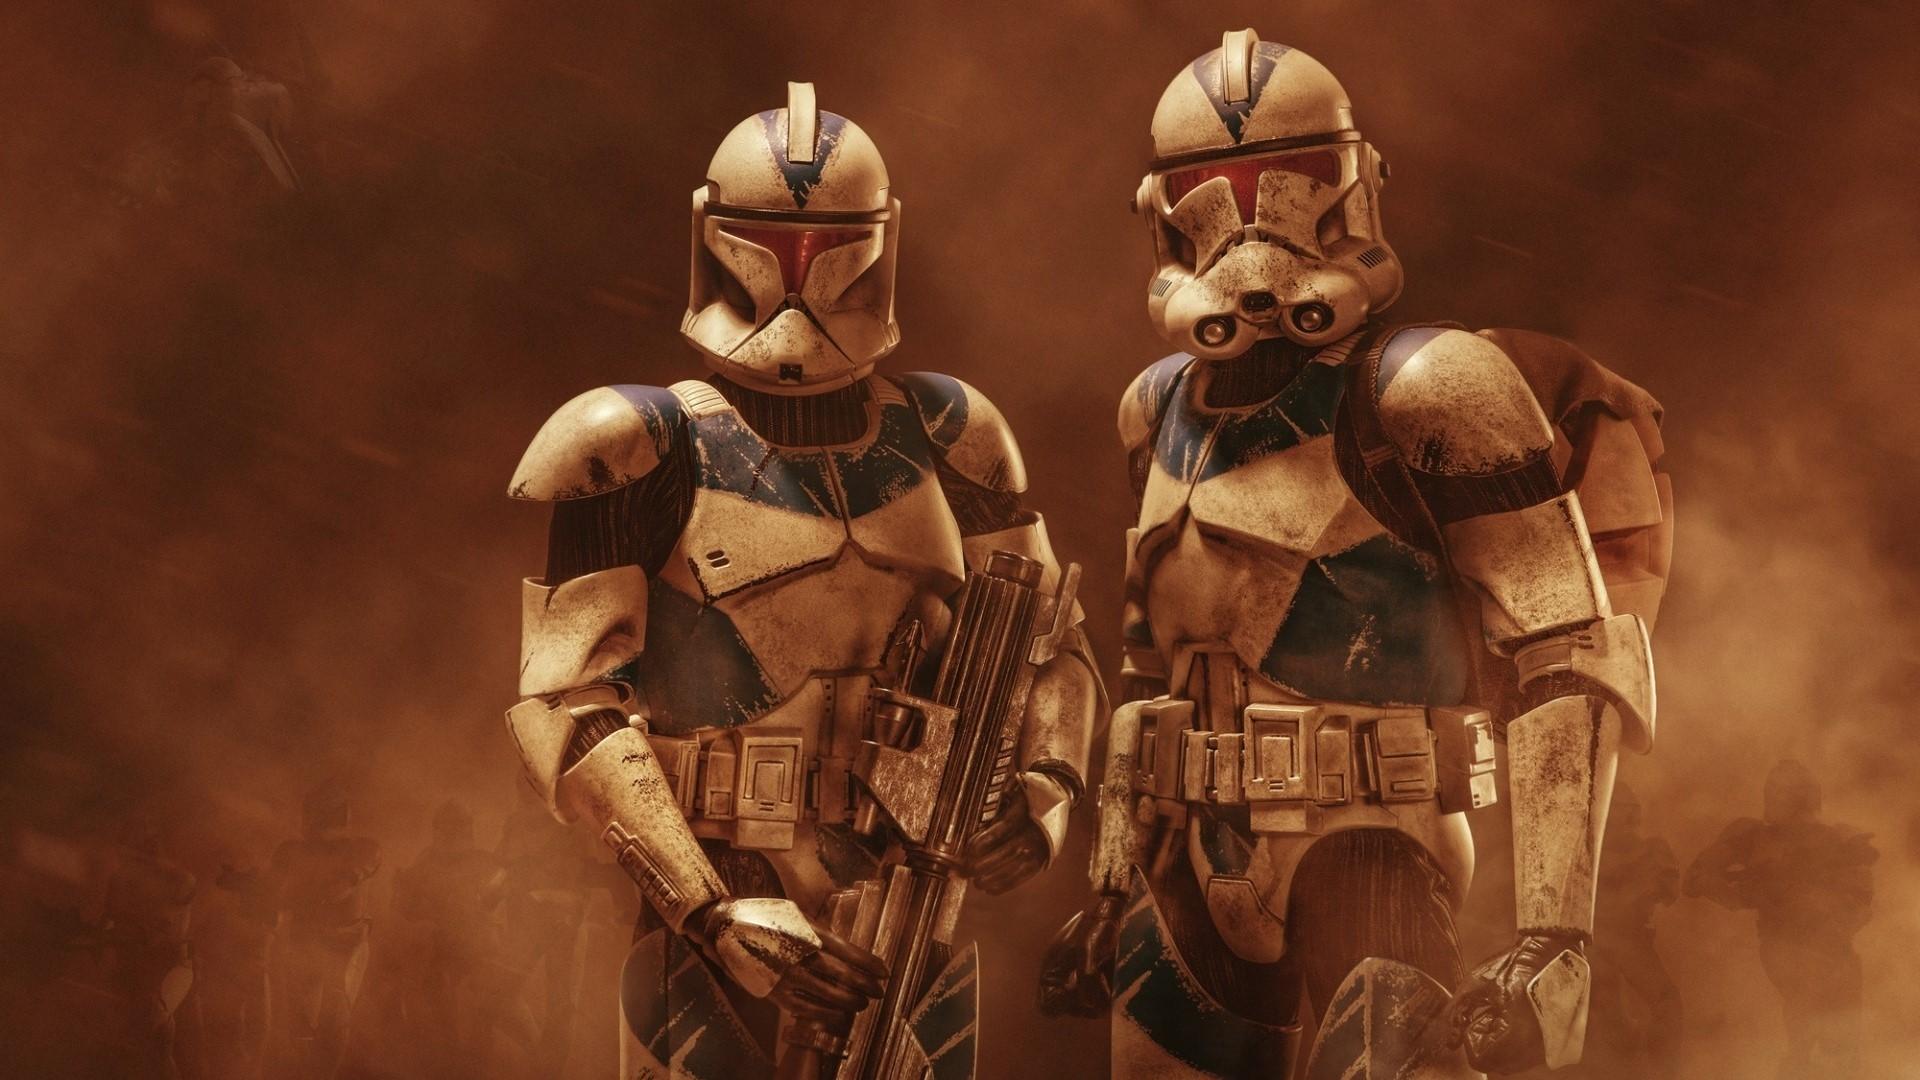 Star Wars Imperial Wallpaper Wallpapertag